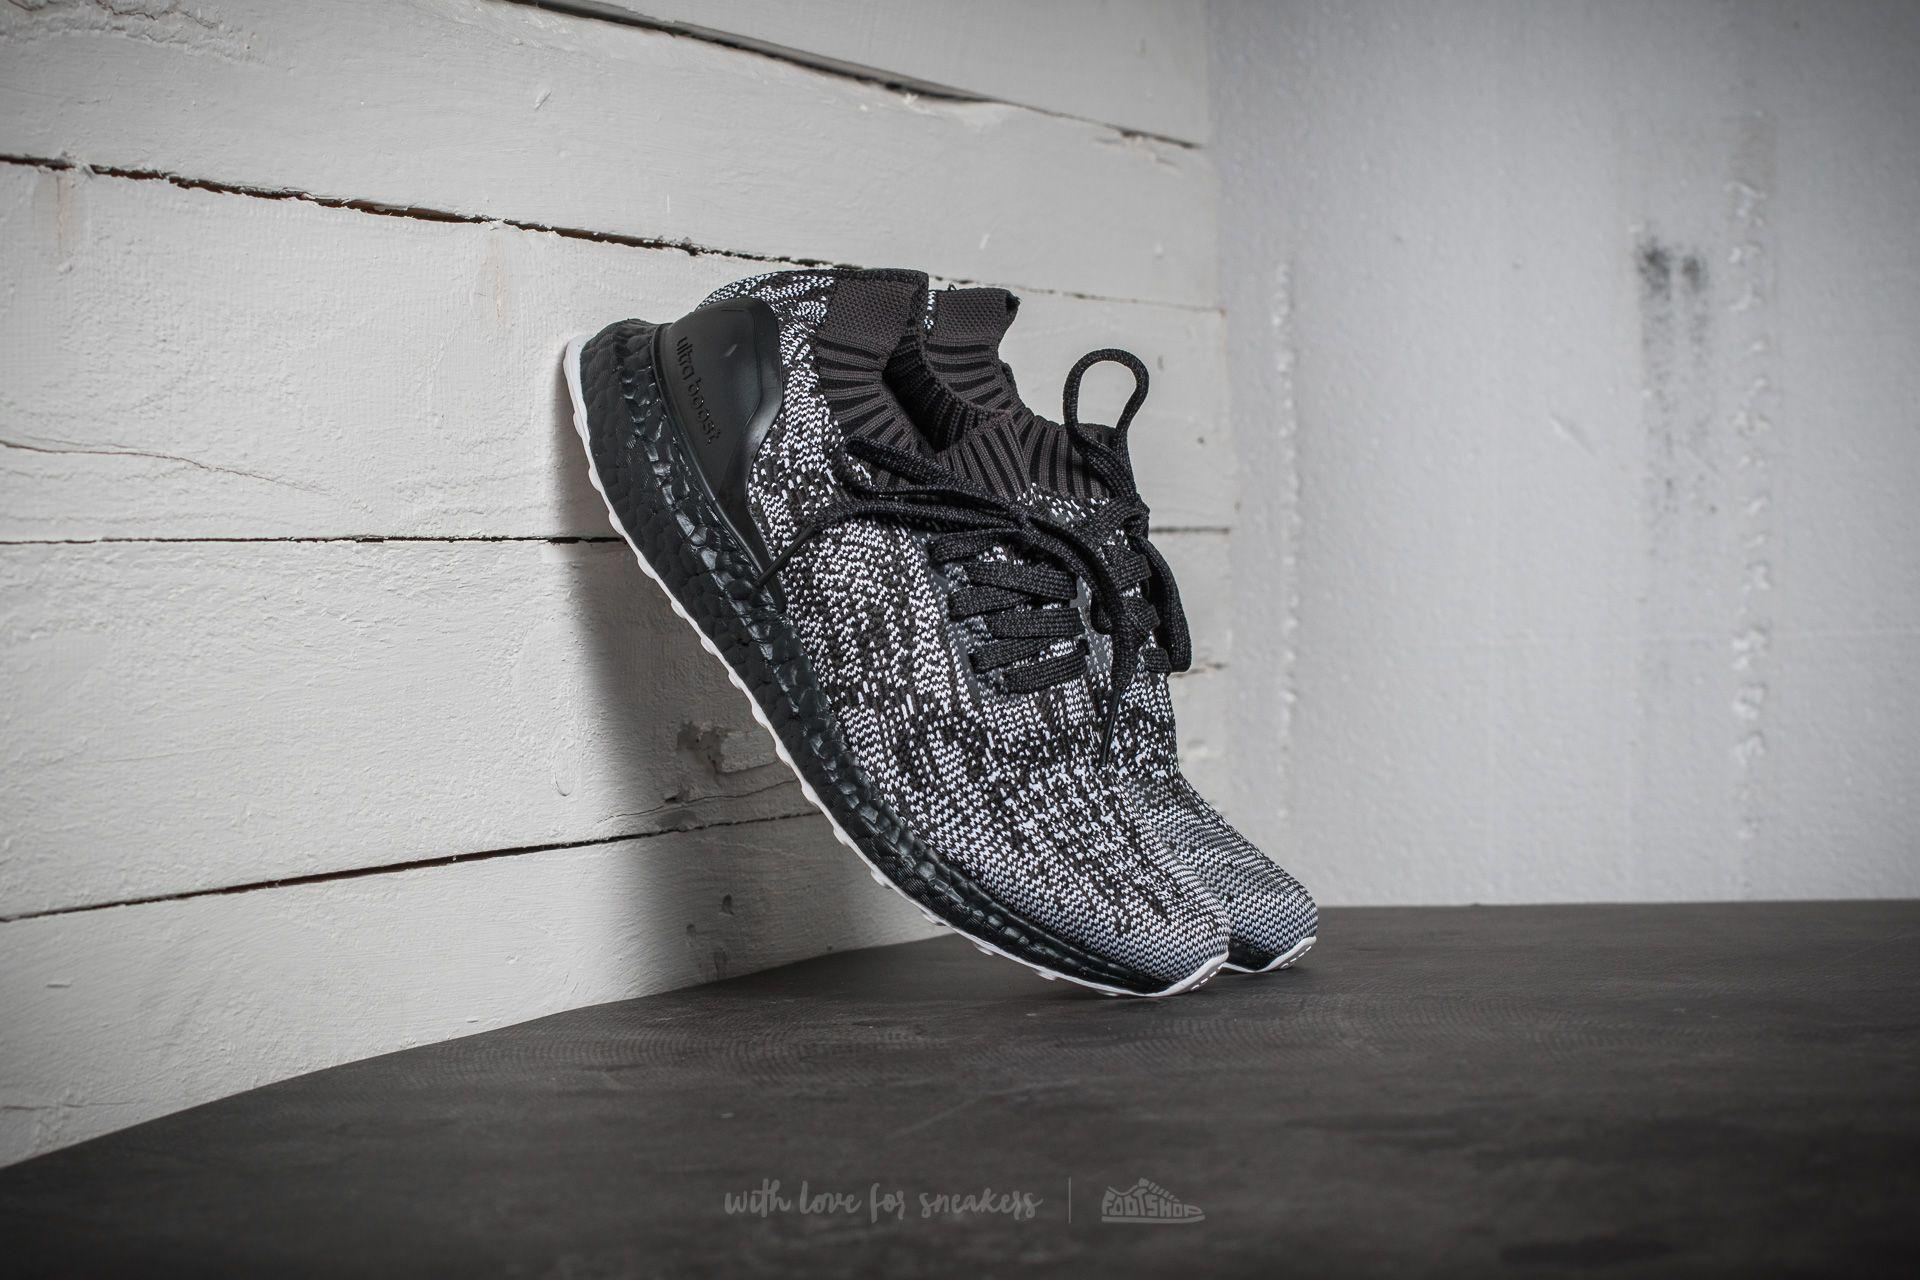 58018ec07 Lyst - Footshop Adidas Ultraboost Uncaged Core Black  Dark Grey ...